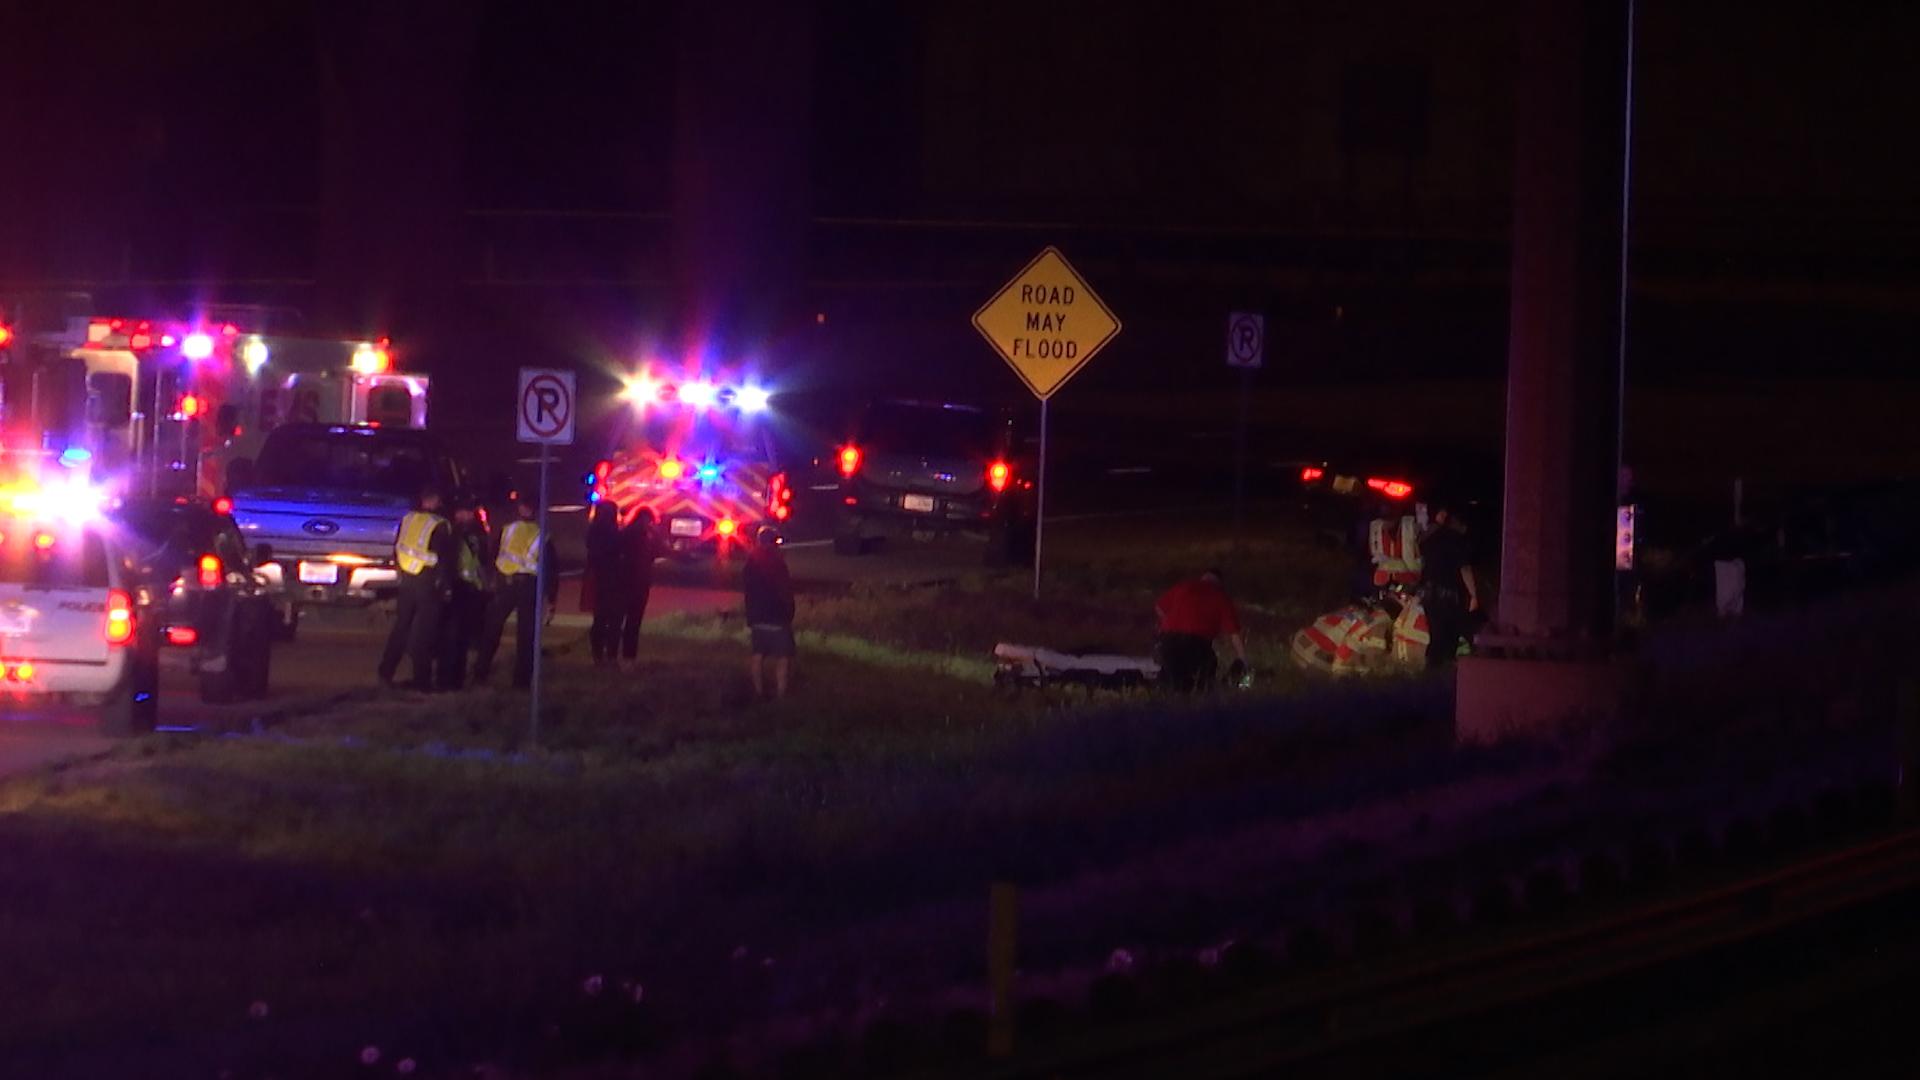 First Responders called to major crash on Marsha Sharp Freeway